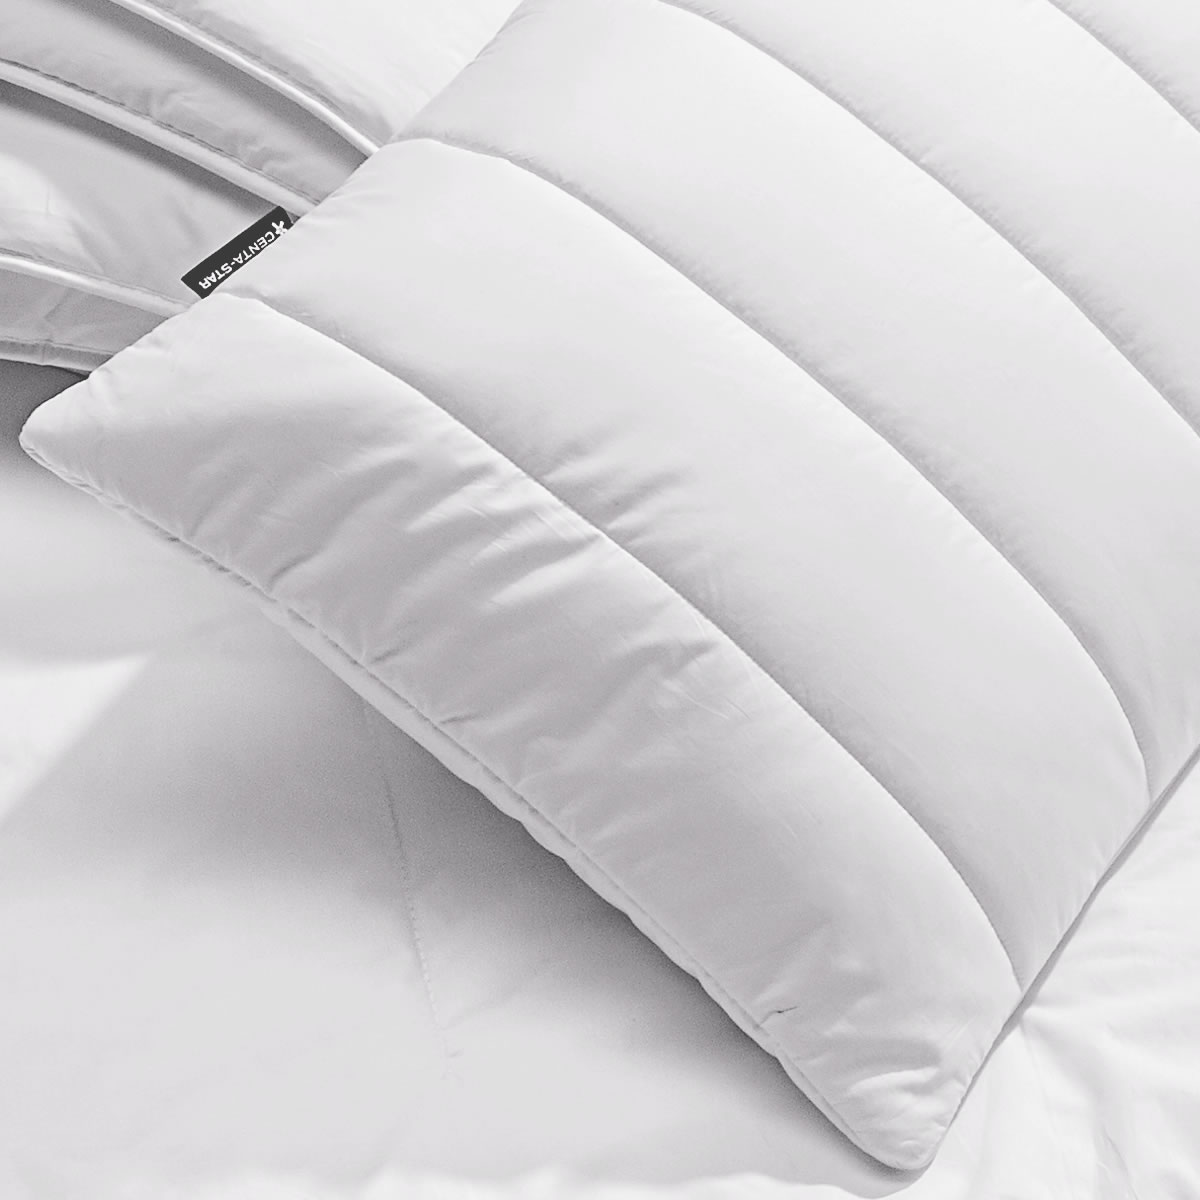 centa star allergo protect kopfkissen 40x80 allergiker kissen. Black Bedroom Furniture Sets. Home Design Ideas